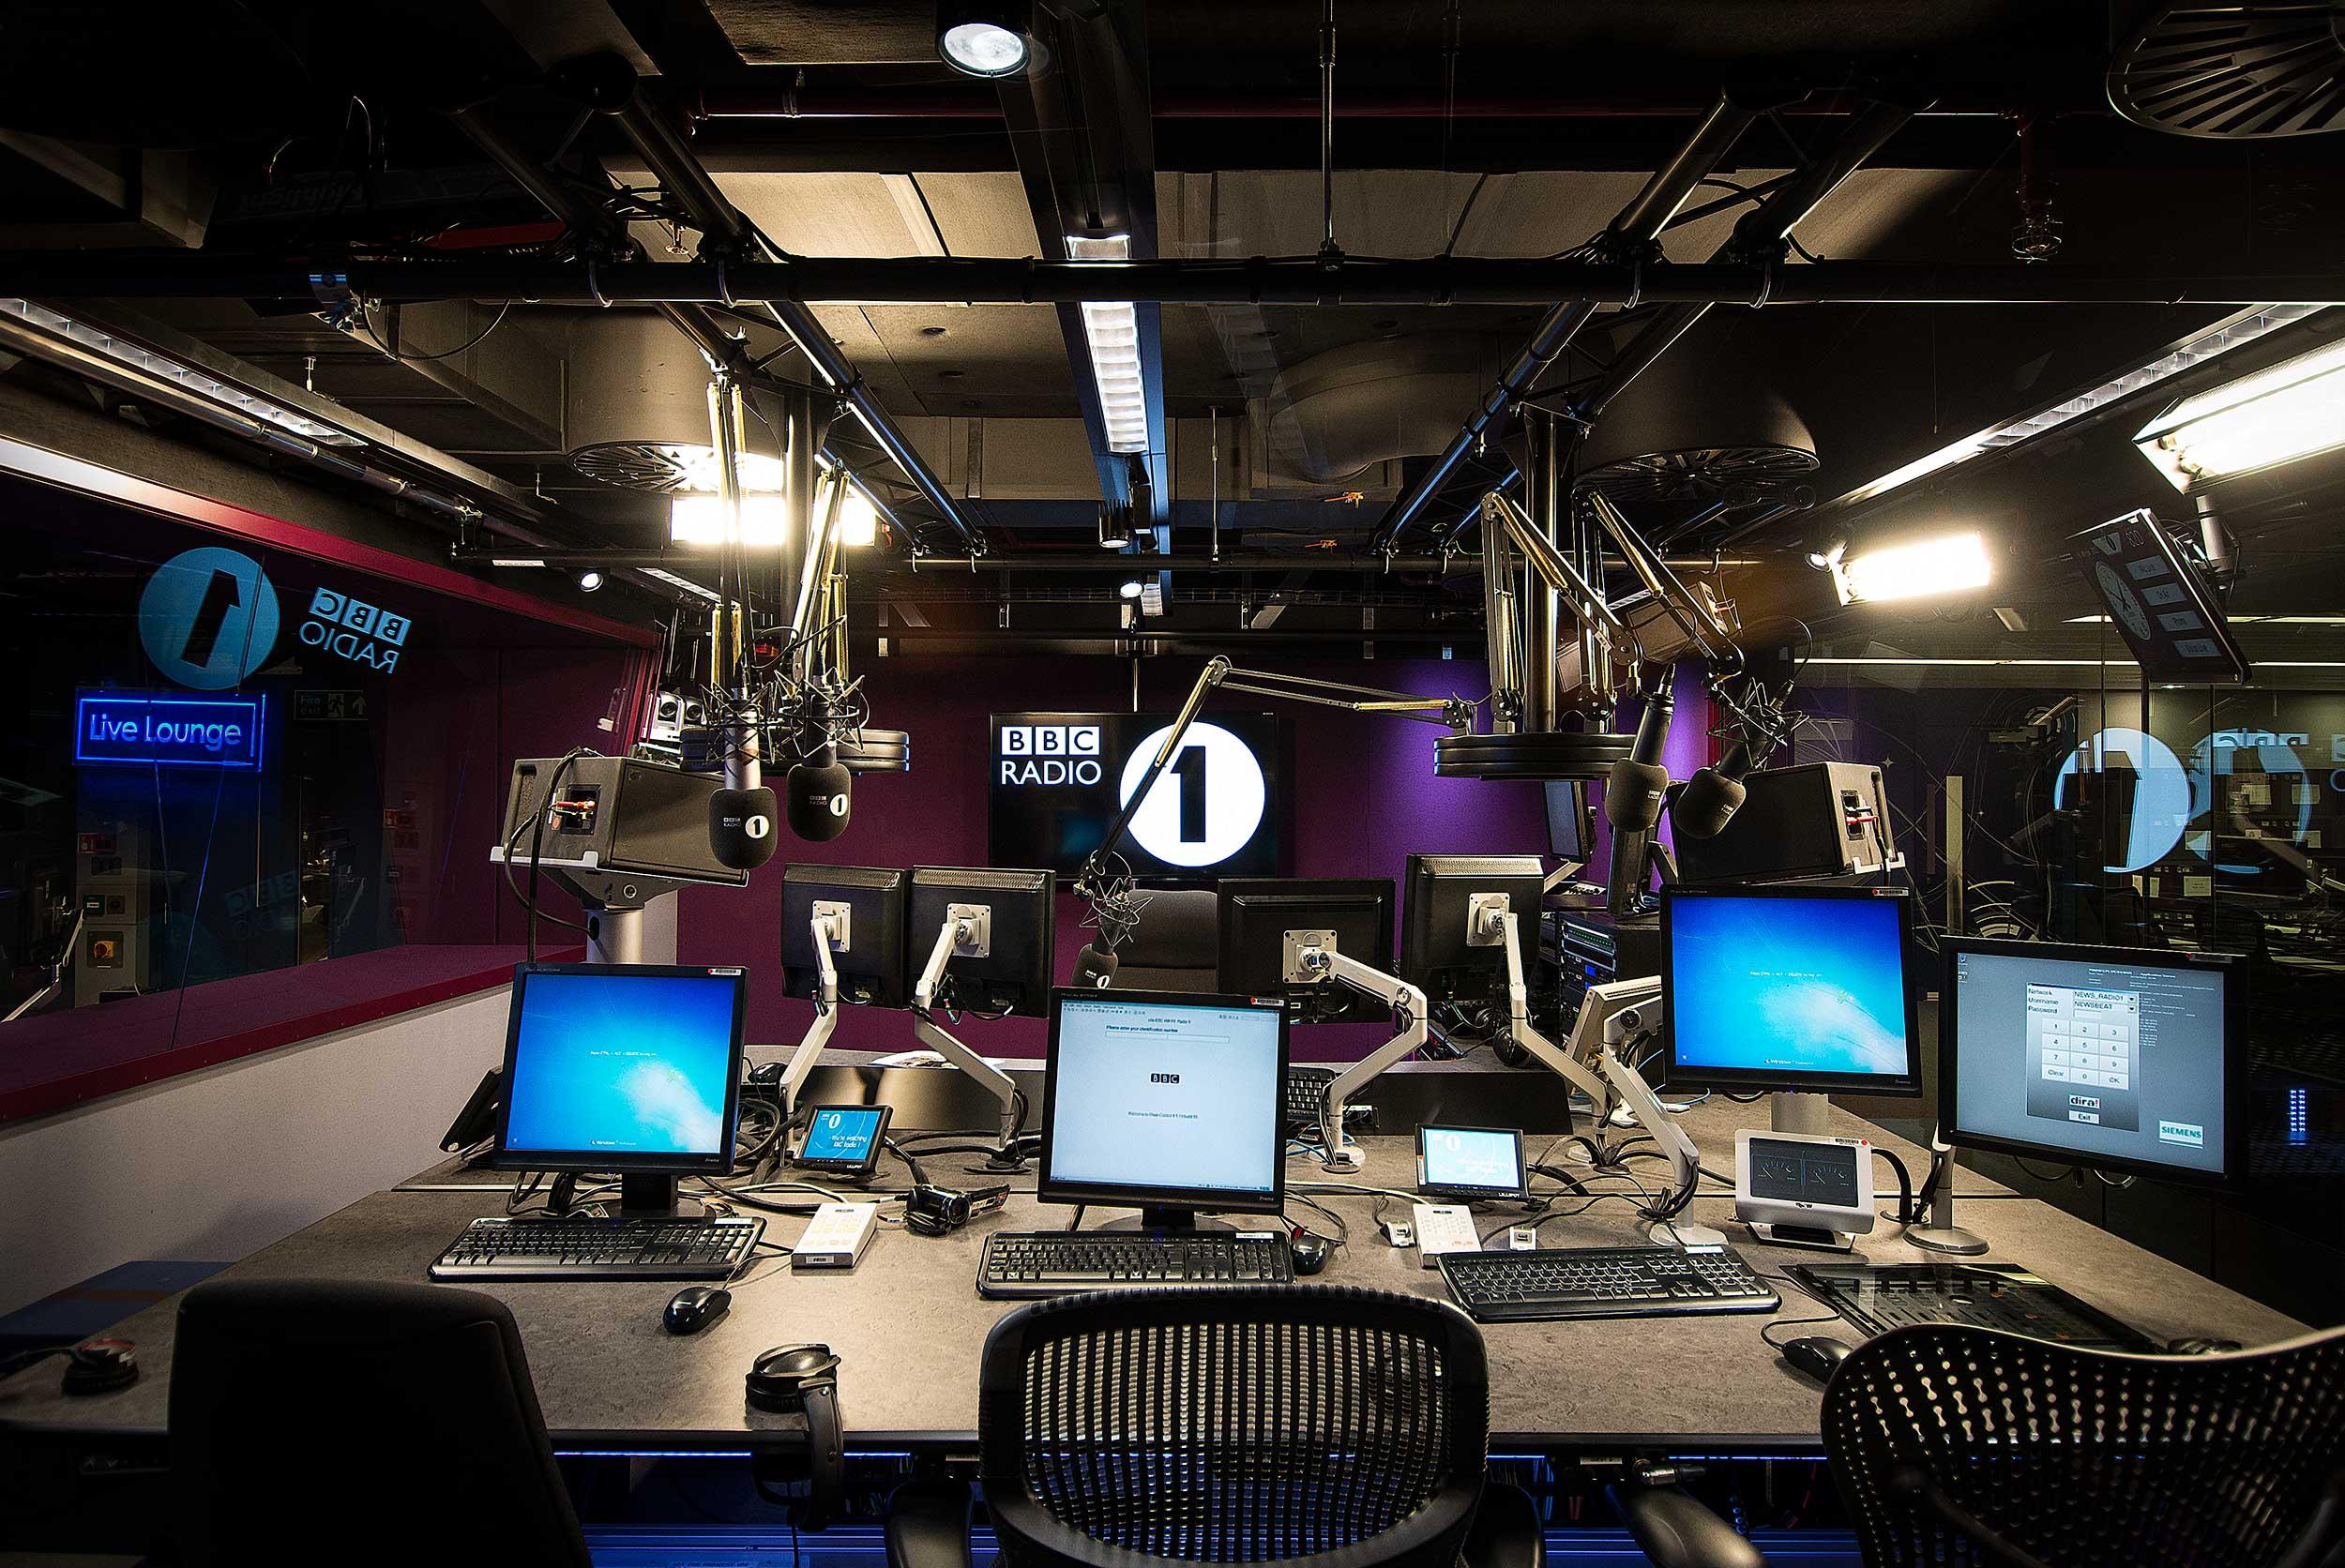 bbc radio 1 studio